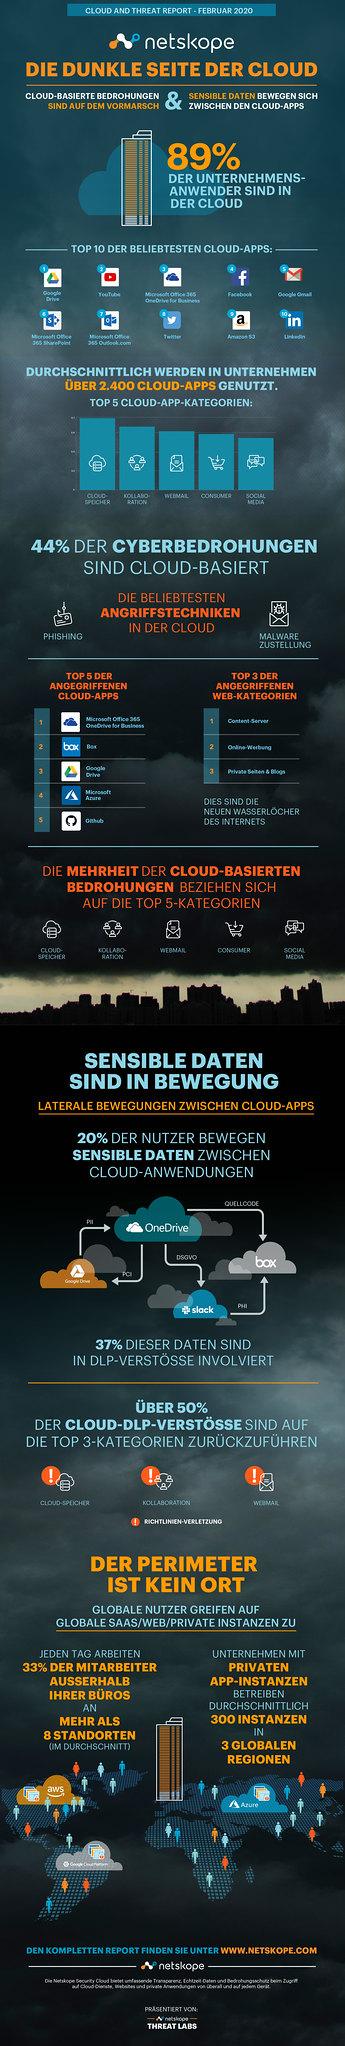 netskope-cloud-threat-report-2020